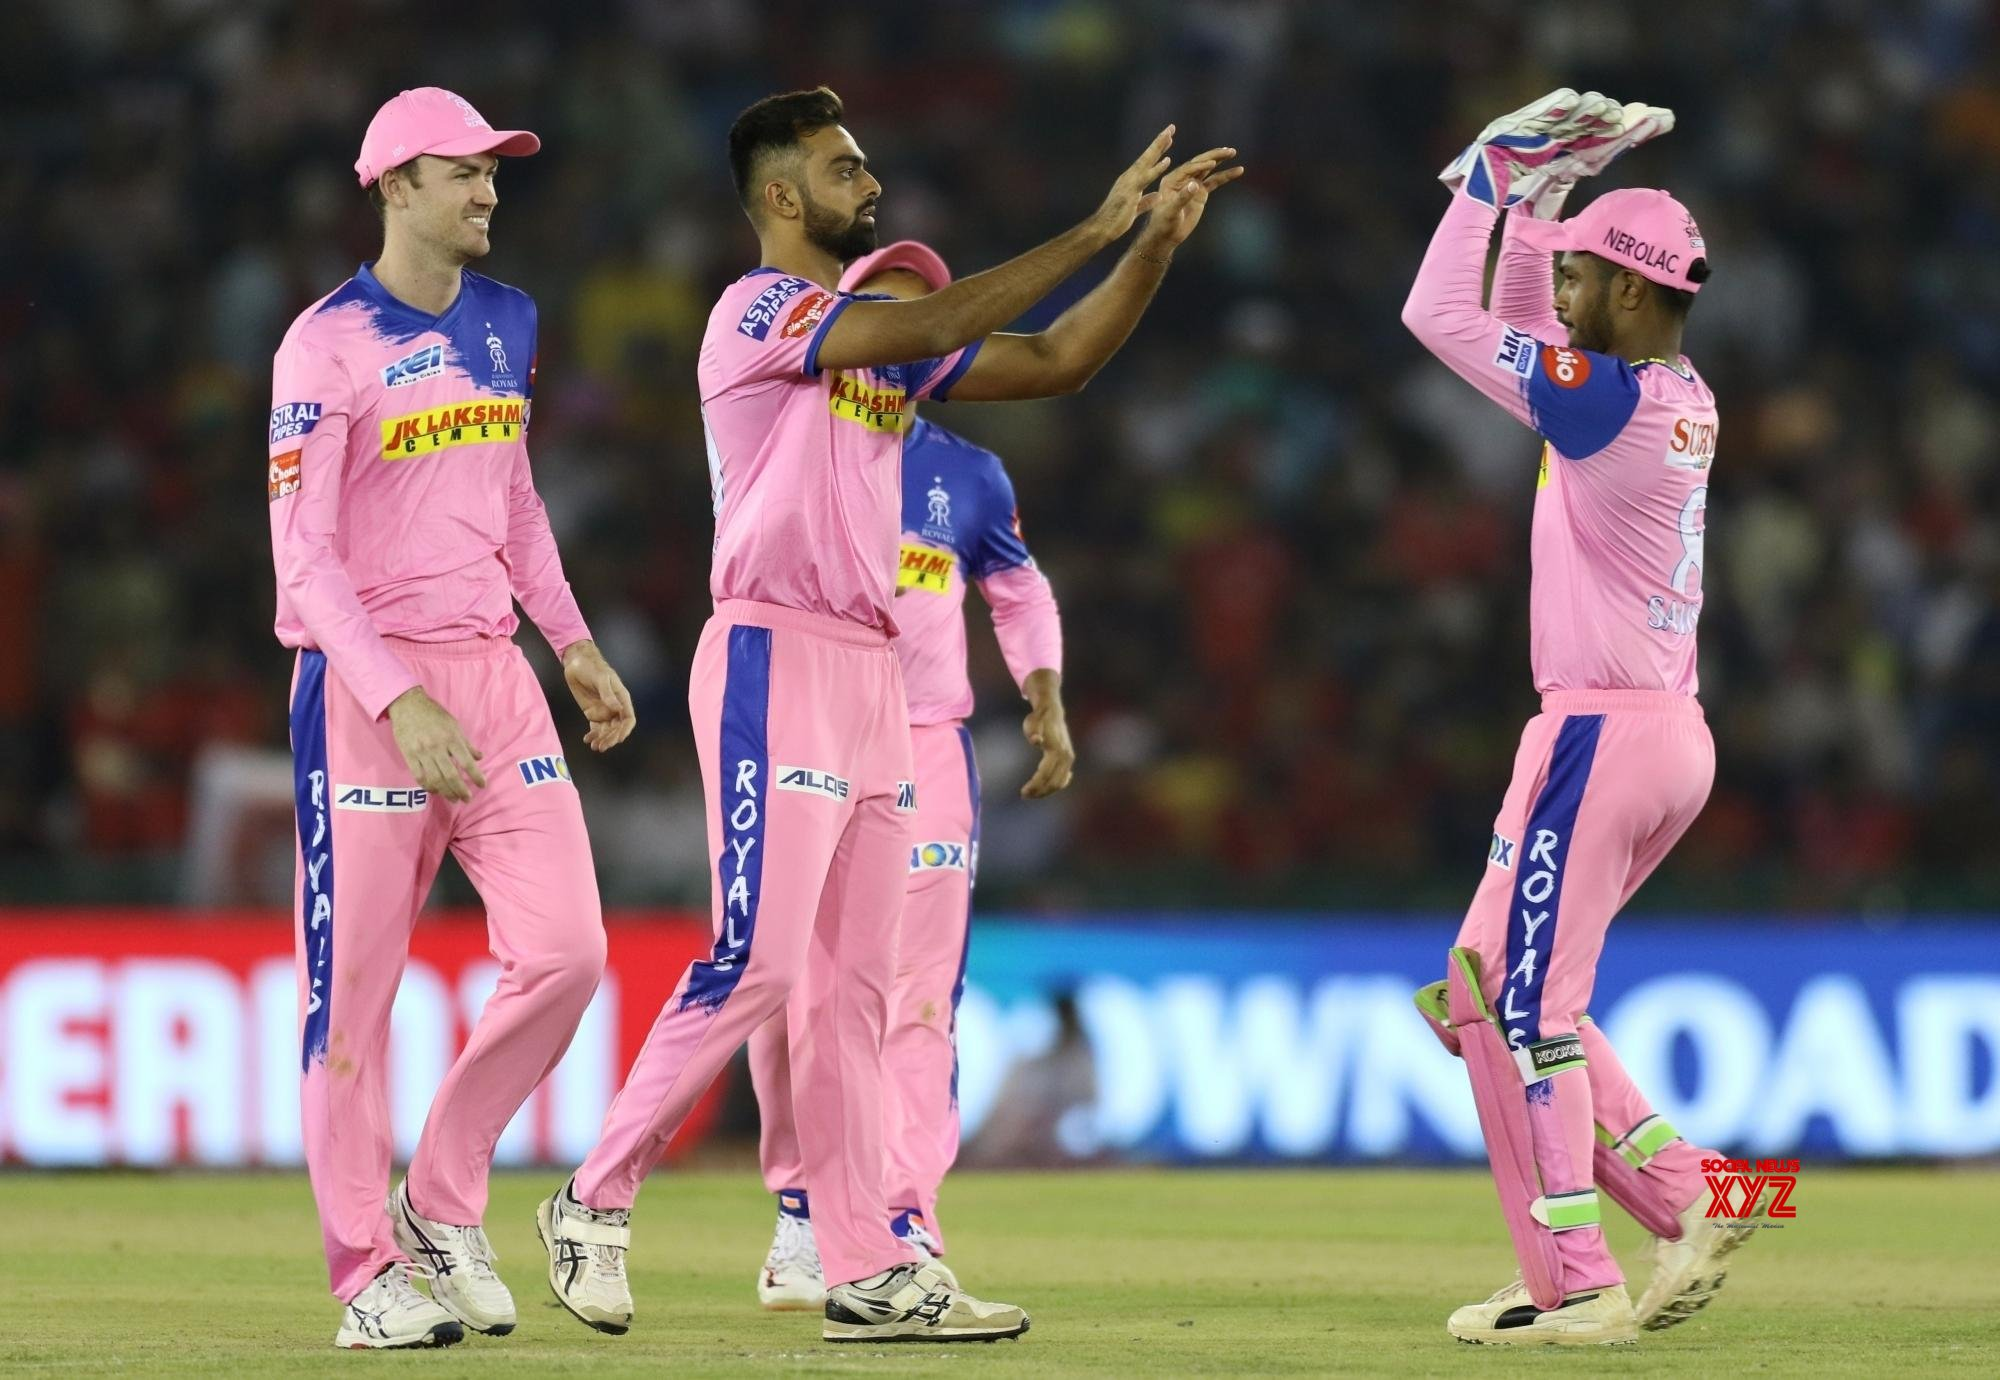 Mohali: IPL 2019 - Match 32 - Kings XI Punjab Vs Rajasthan Royals (Batch - 18) #Gallery